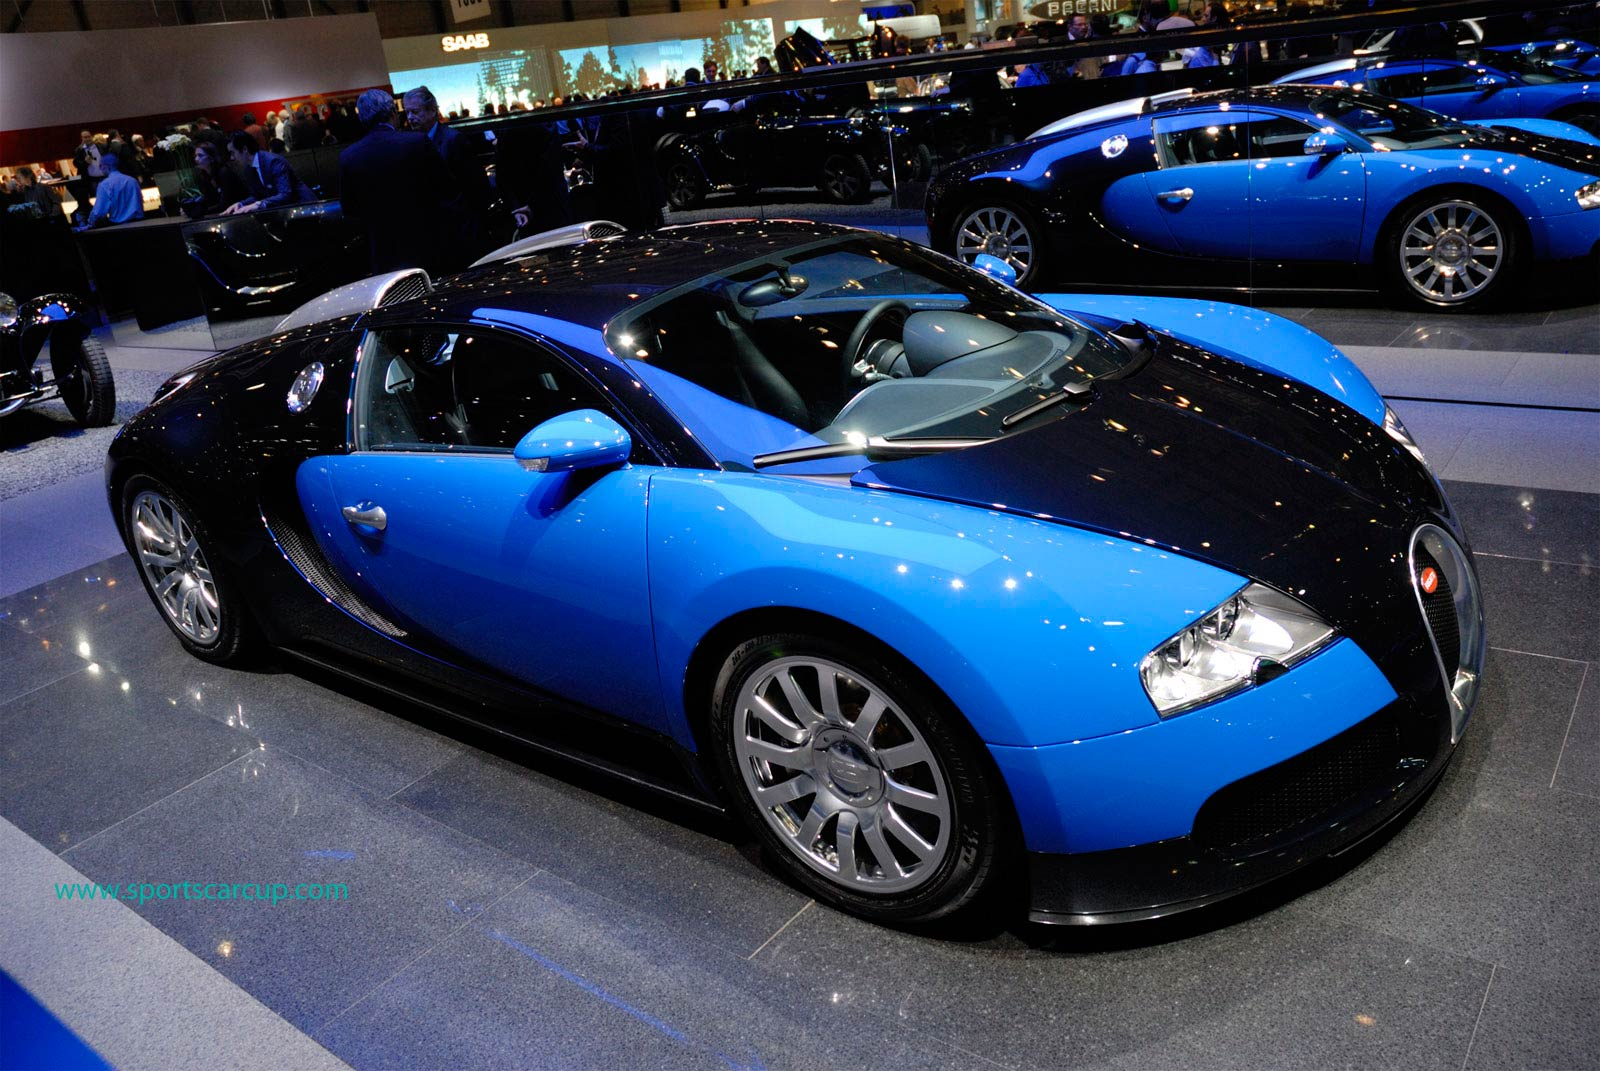 Picture of Bugatti Veyron at Autoshow Geneva Wallpaper Desktop Download